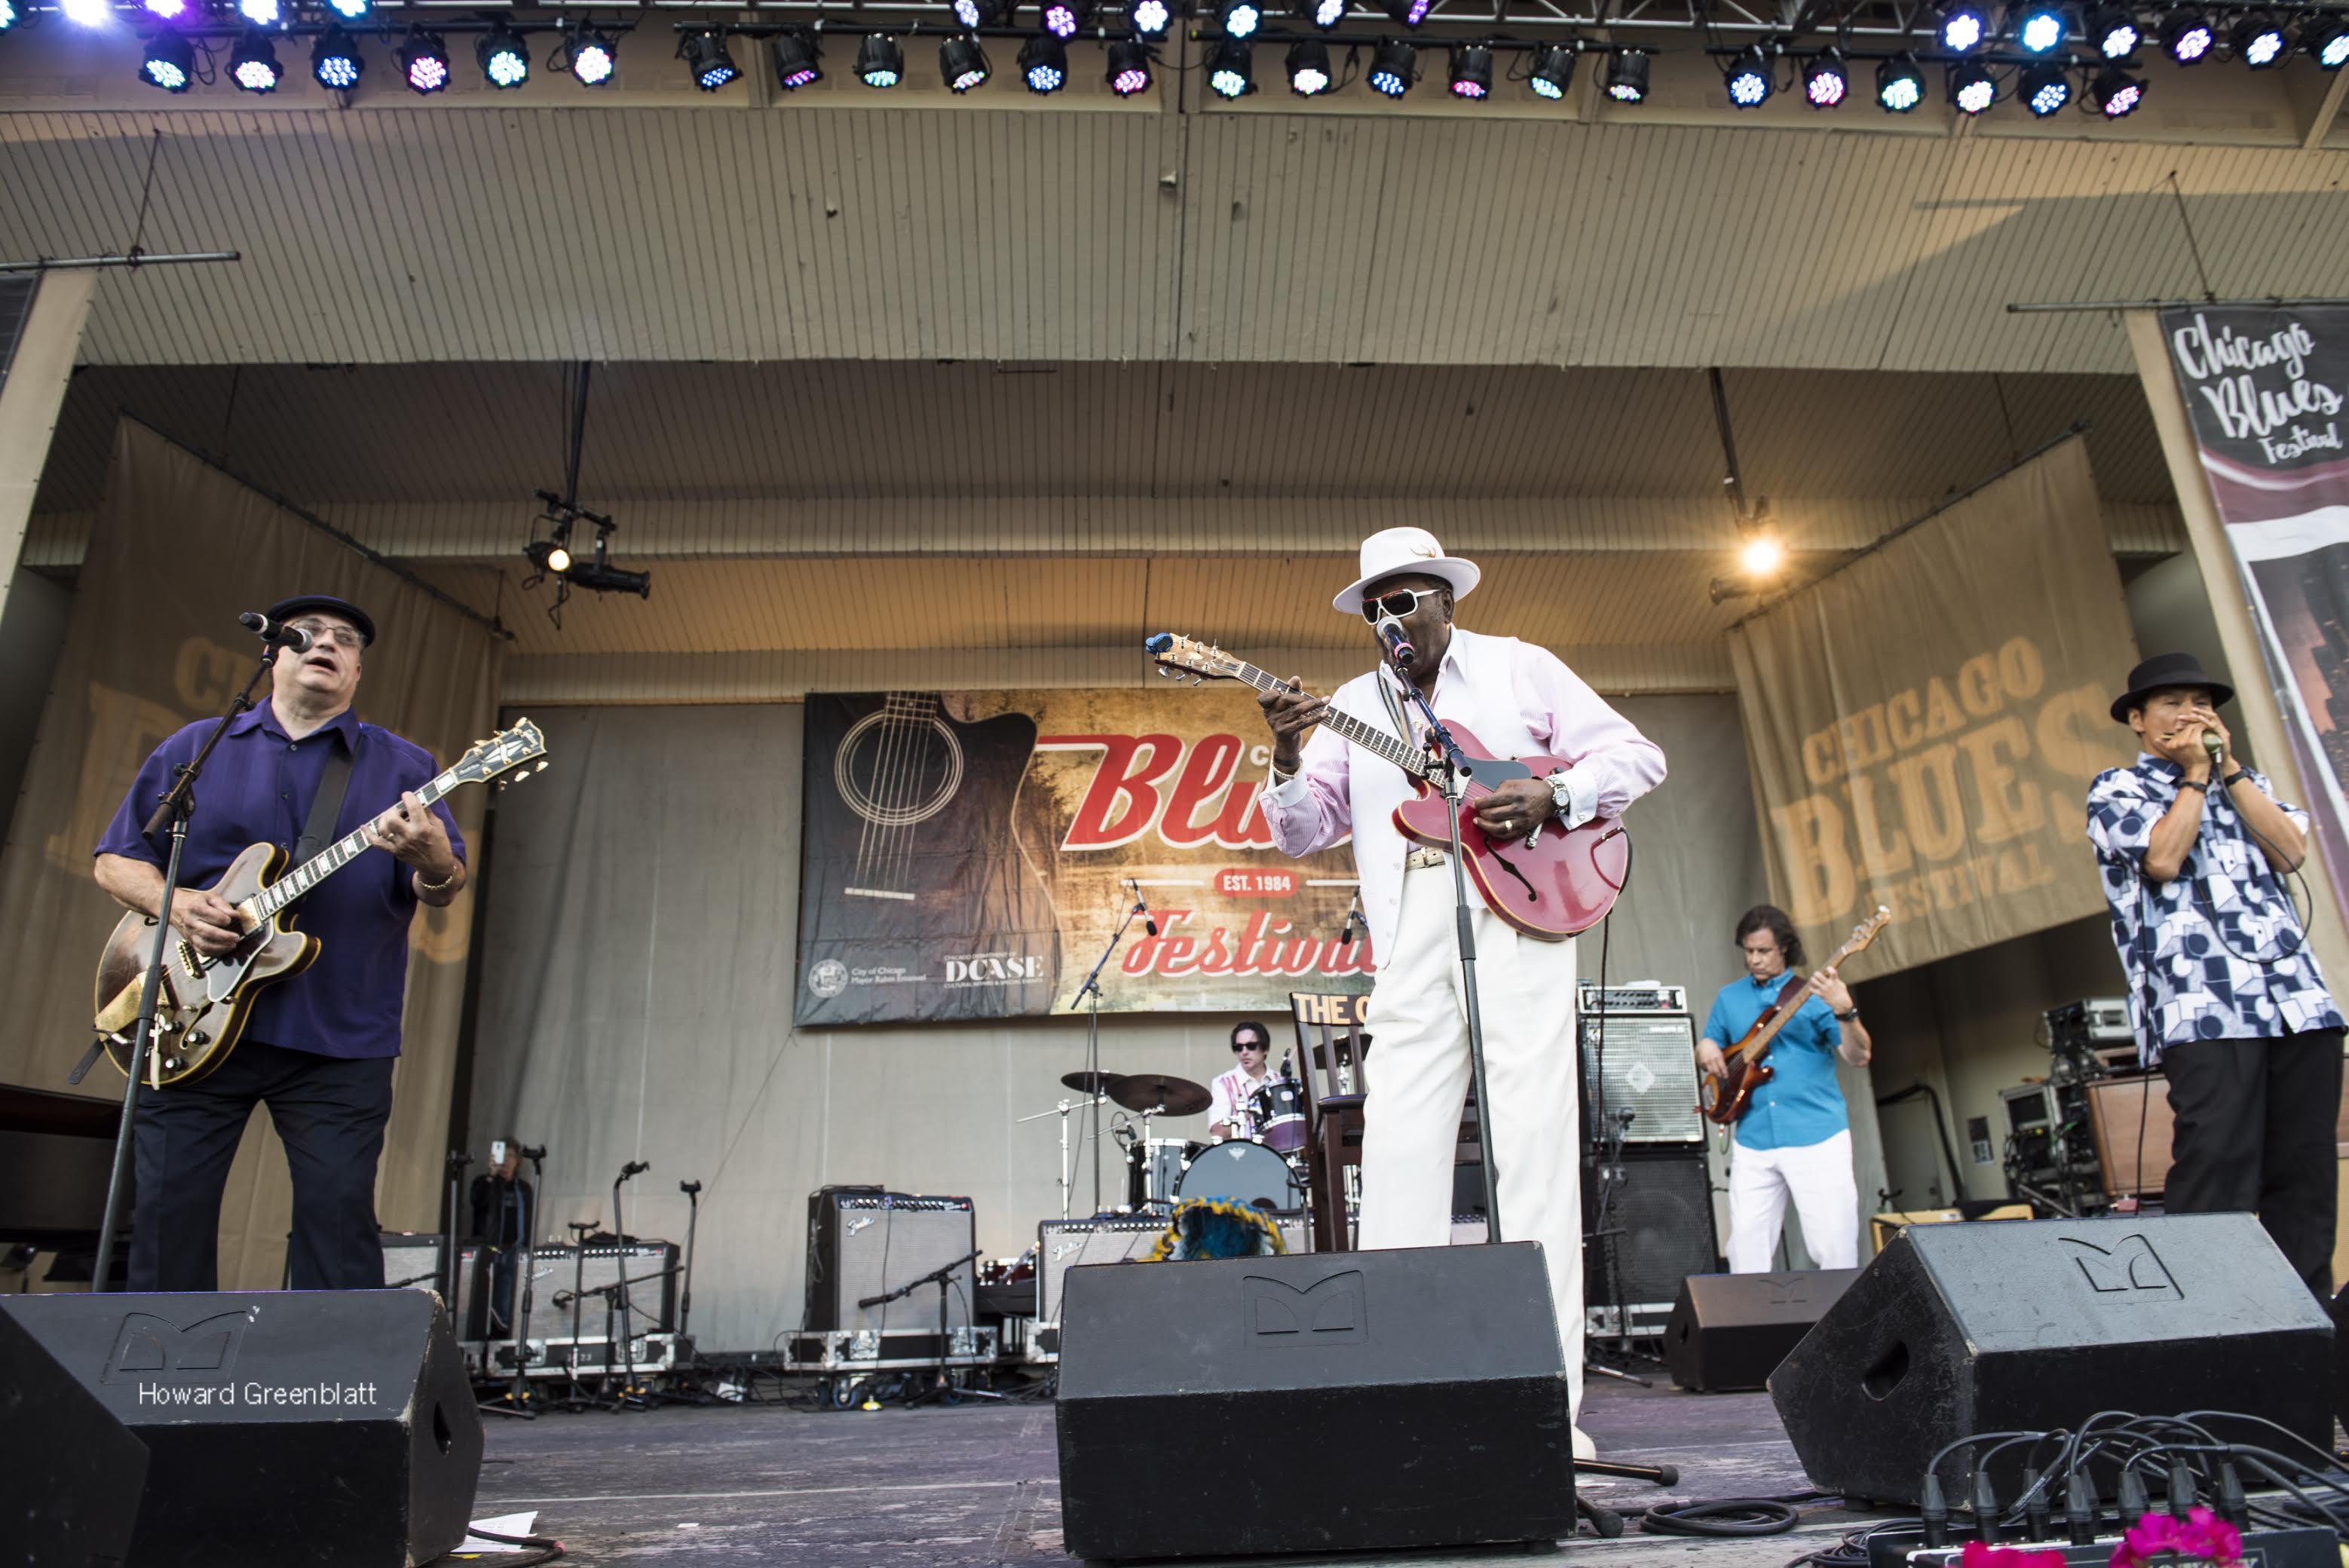 Photo Essay | Sunday at Chicago Blues Fest 2016